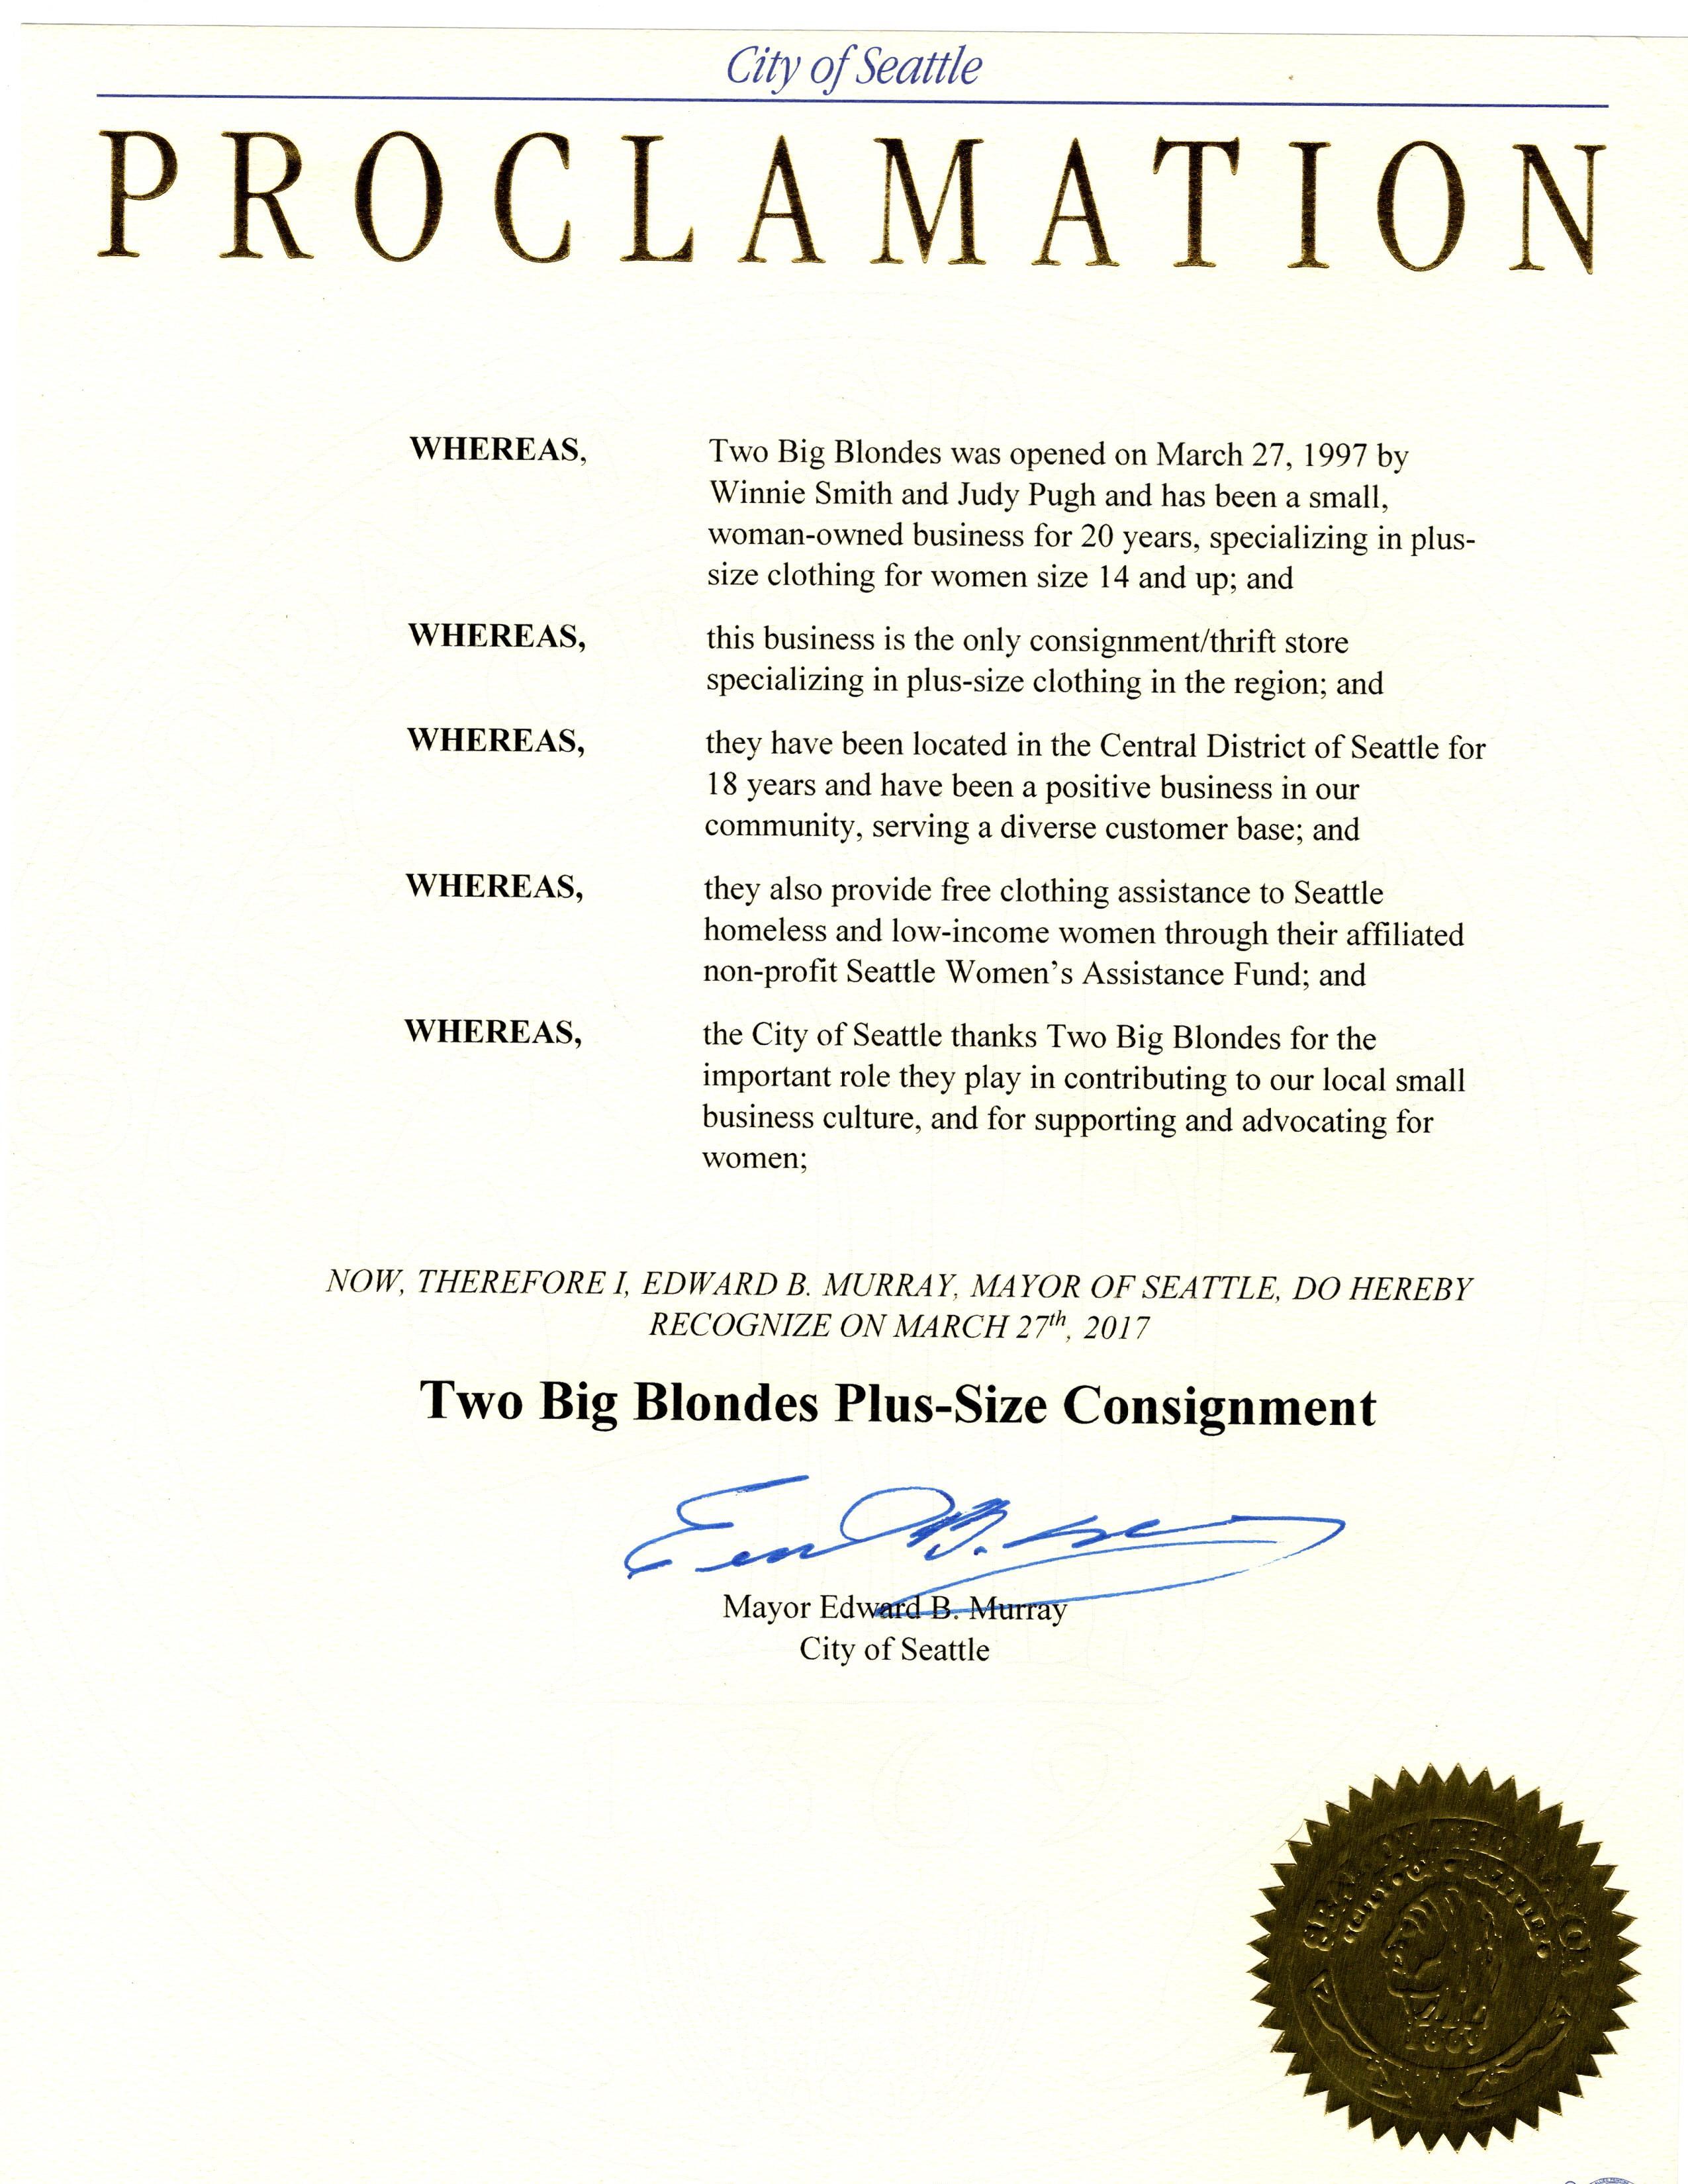 TBB Proclamation 3-27-17